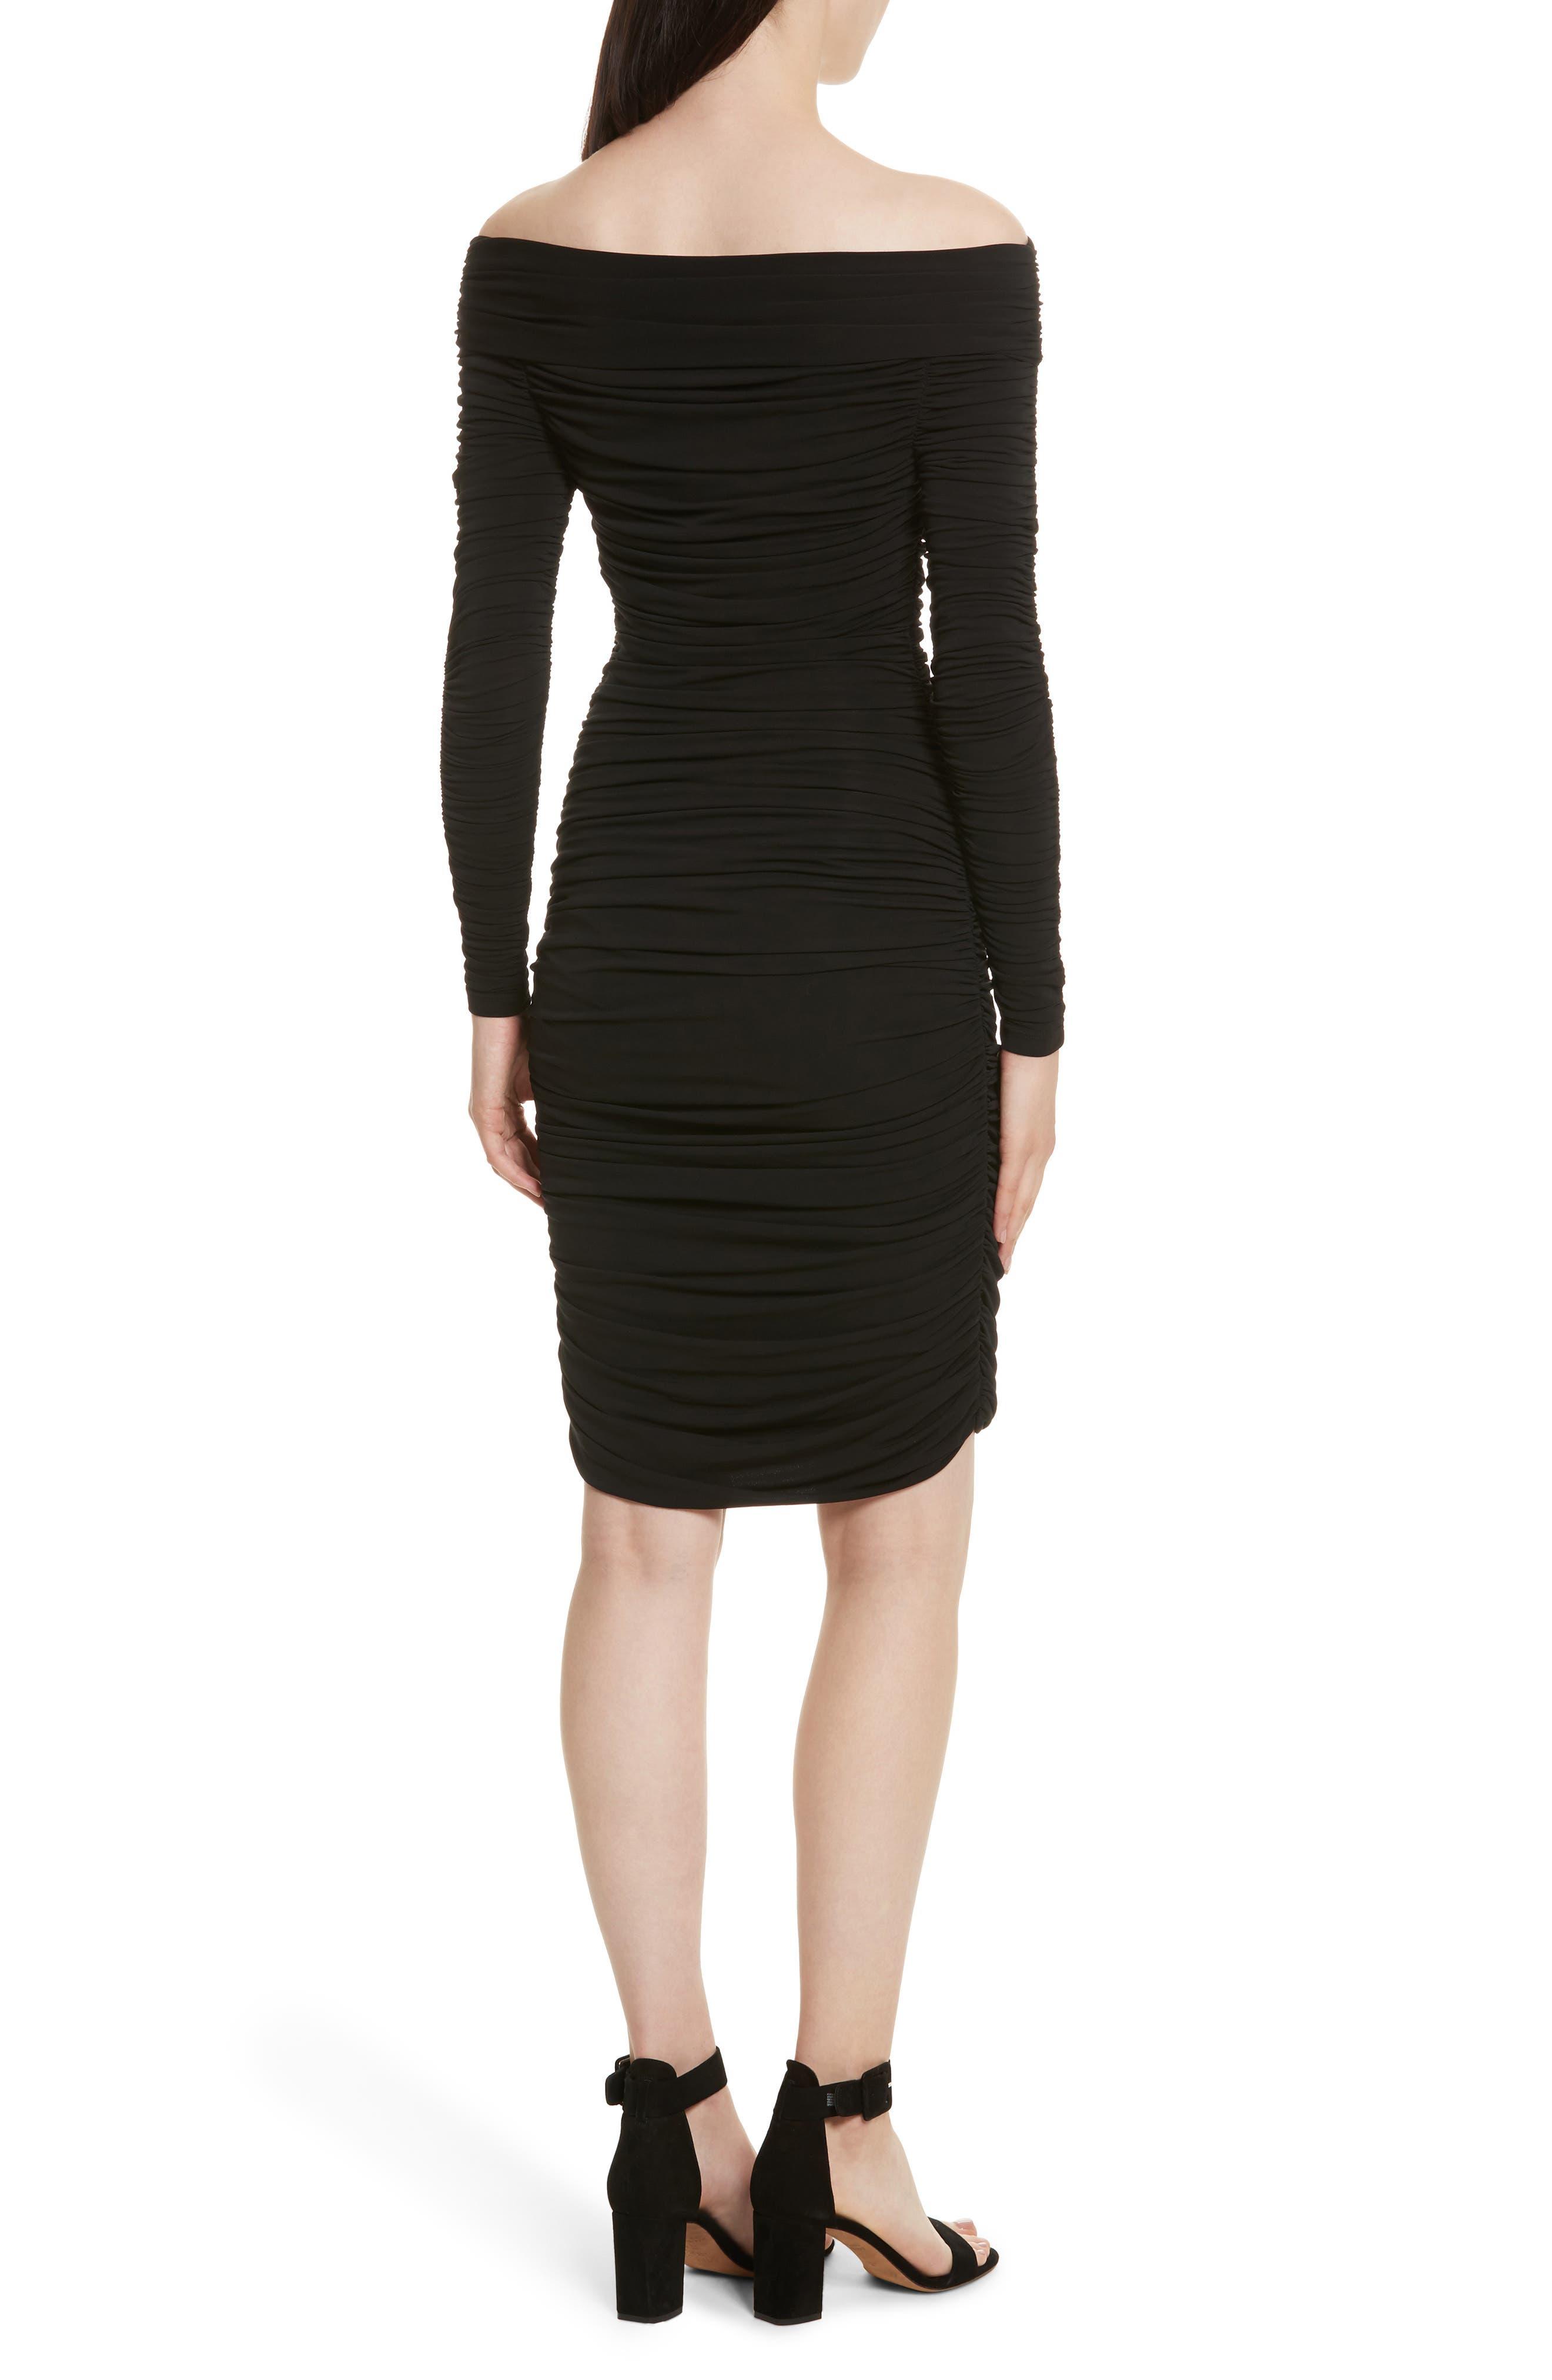 Blaise Off the Shoulder Ruched Dress,                             Alternate thumbnail 2, color,                             Black